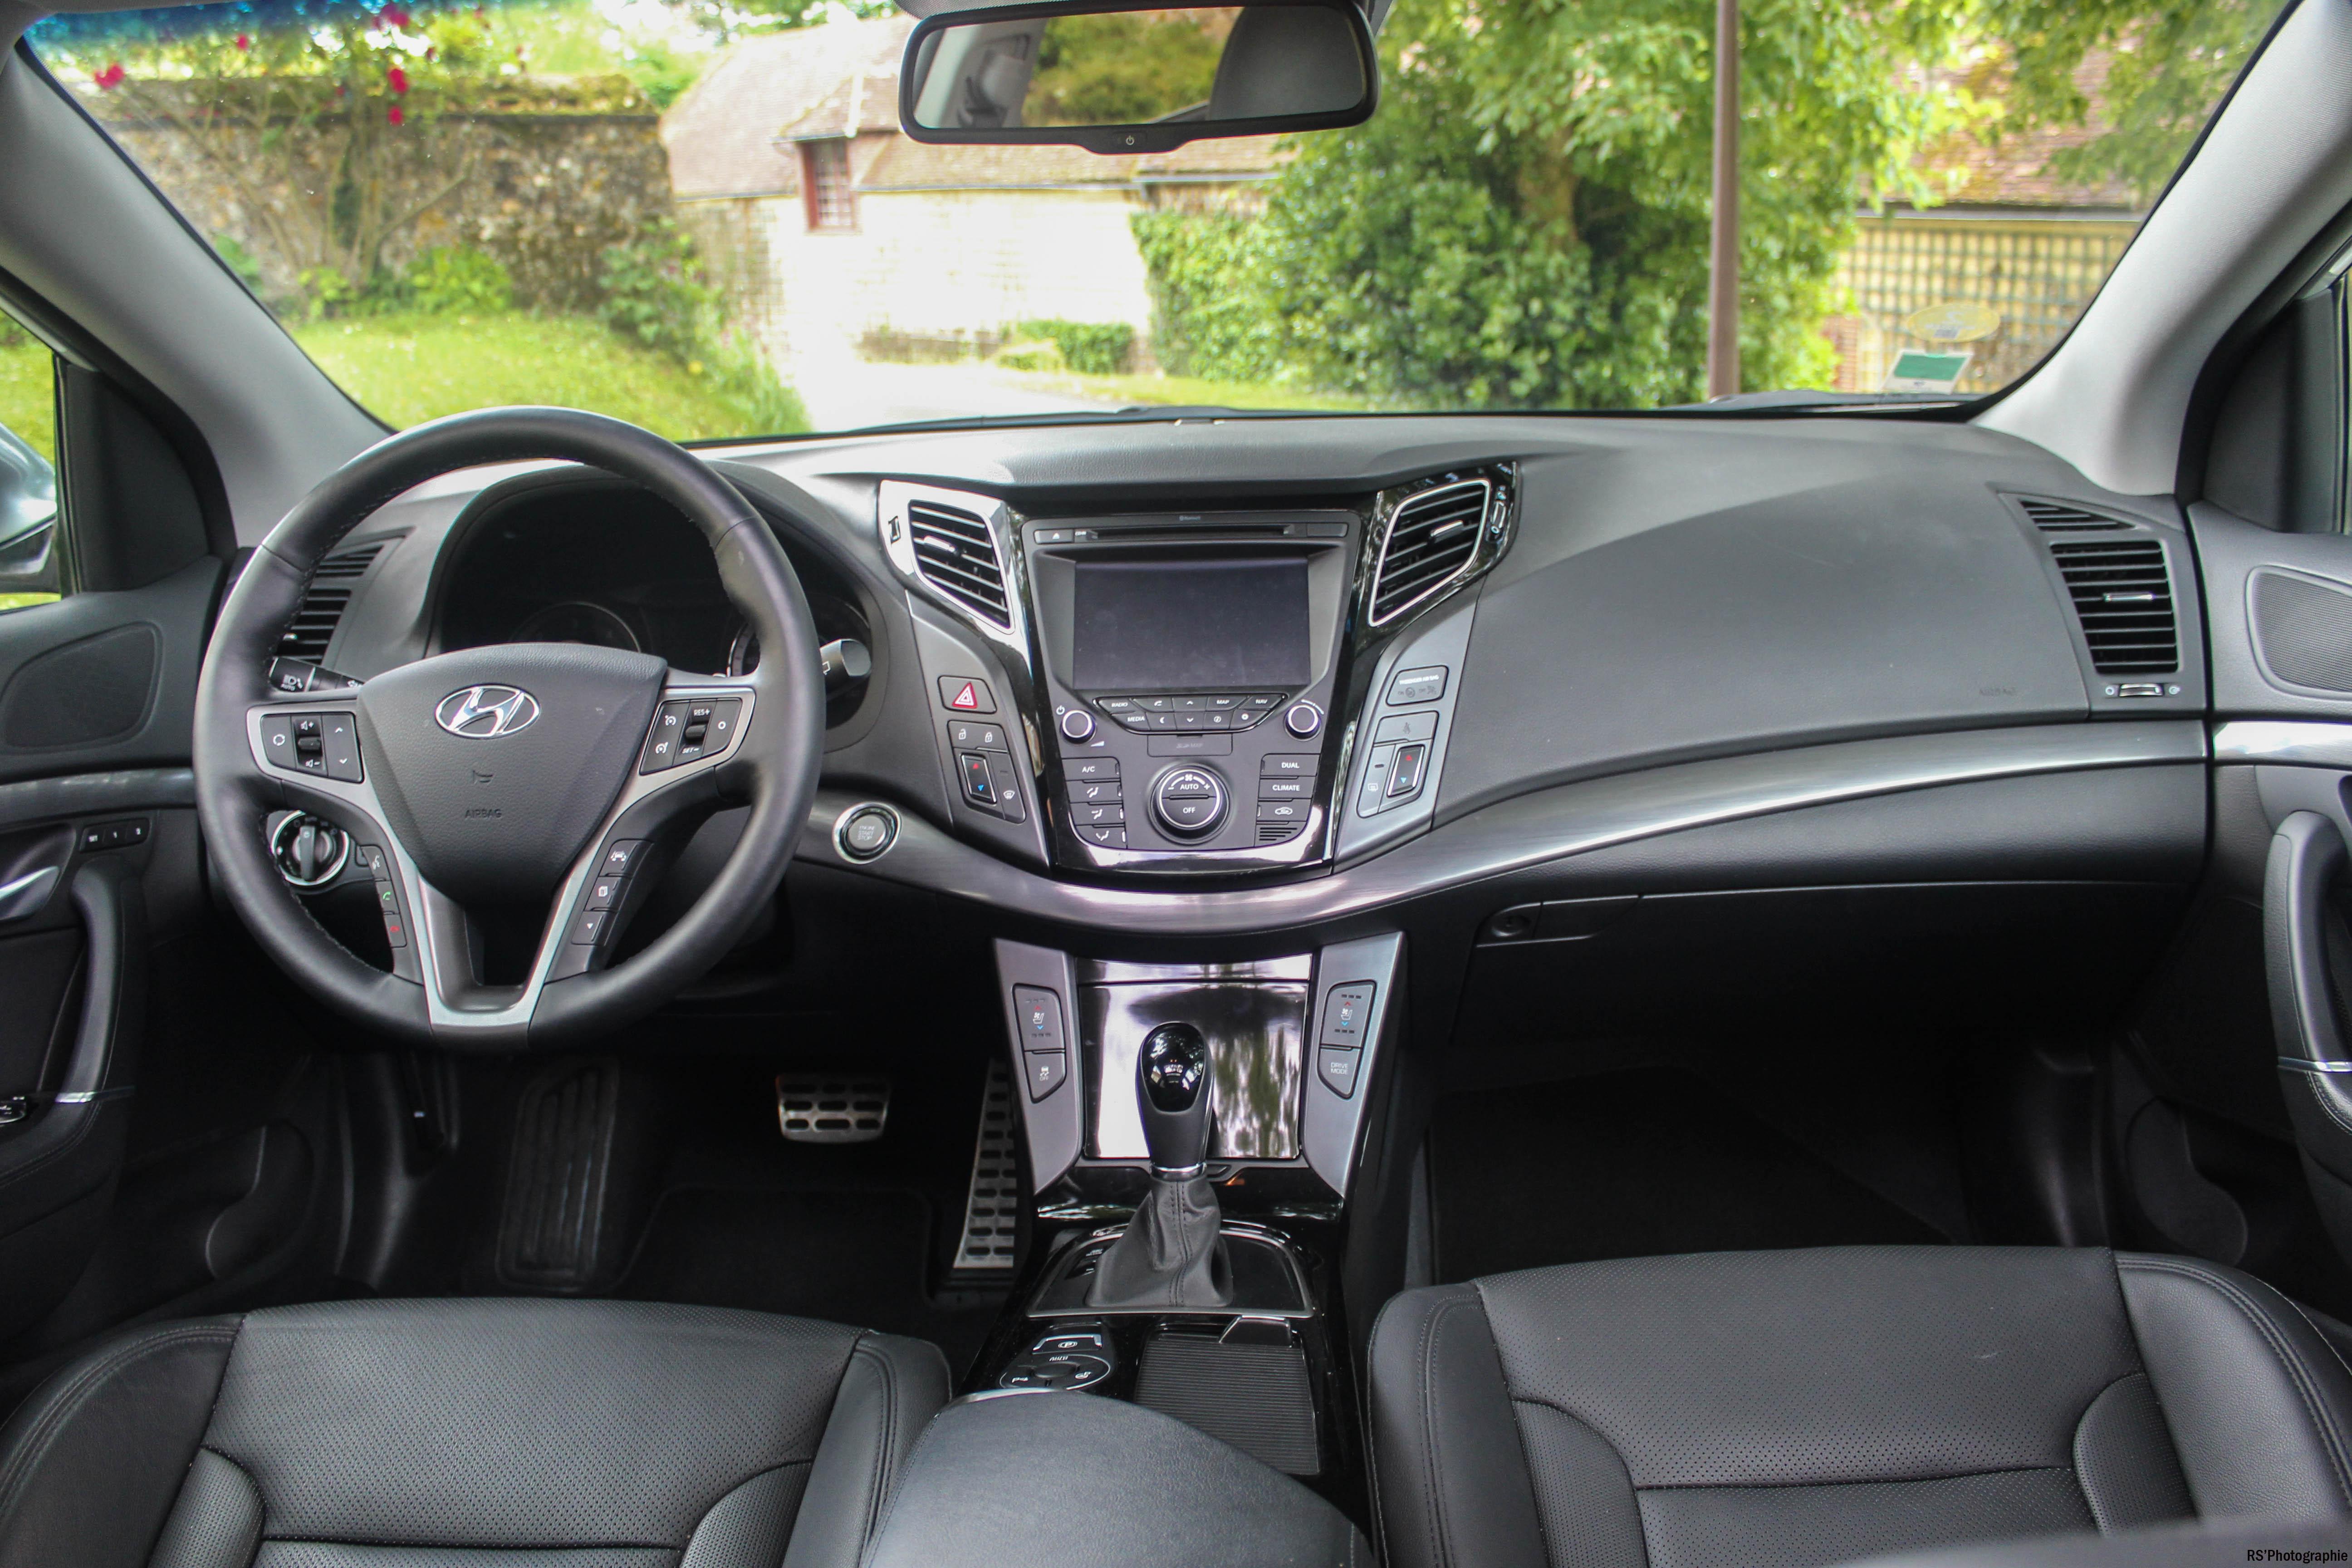 Hyundaii40SW17-hyundai-i40-sw-intérieur-onboard-arnaud-demasier-RSPhotographie